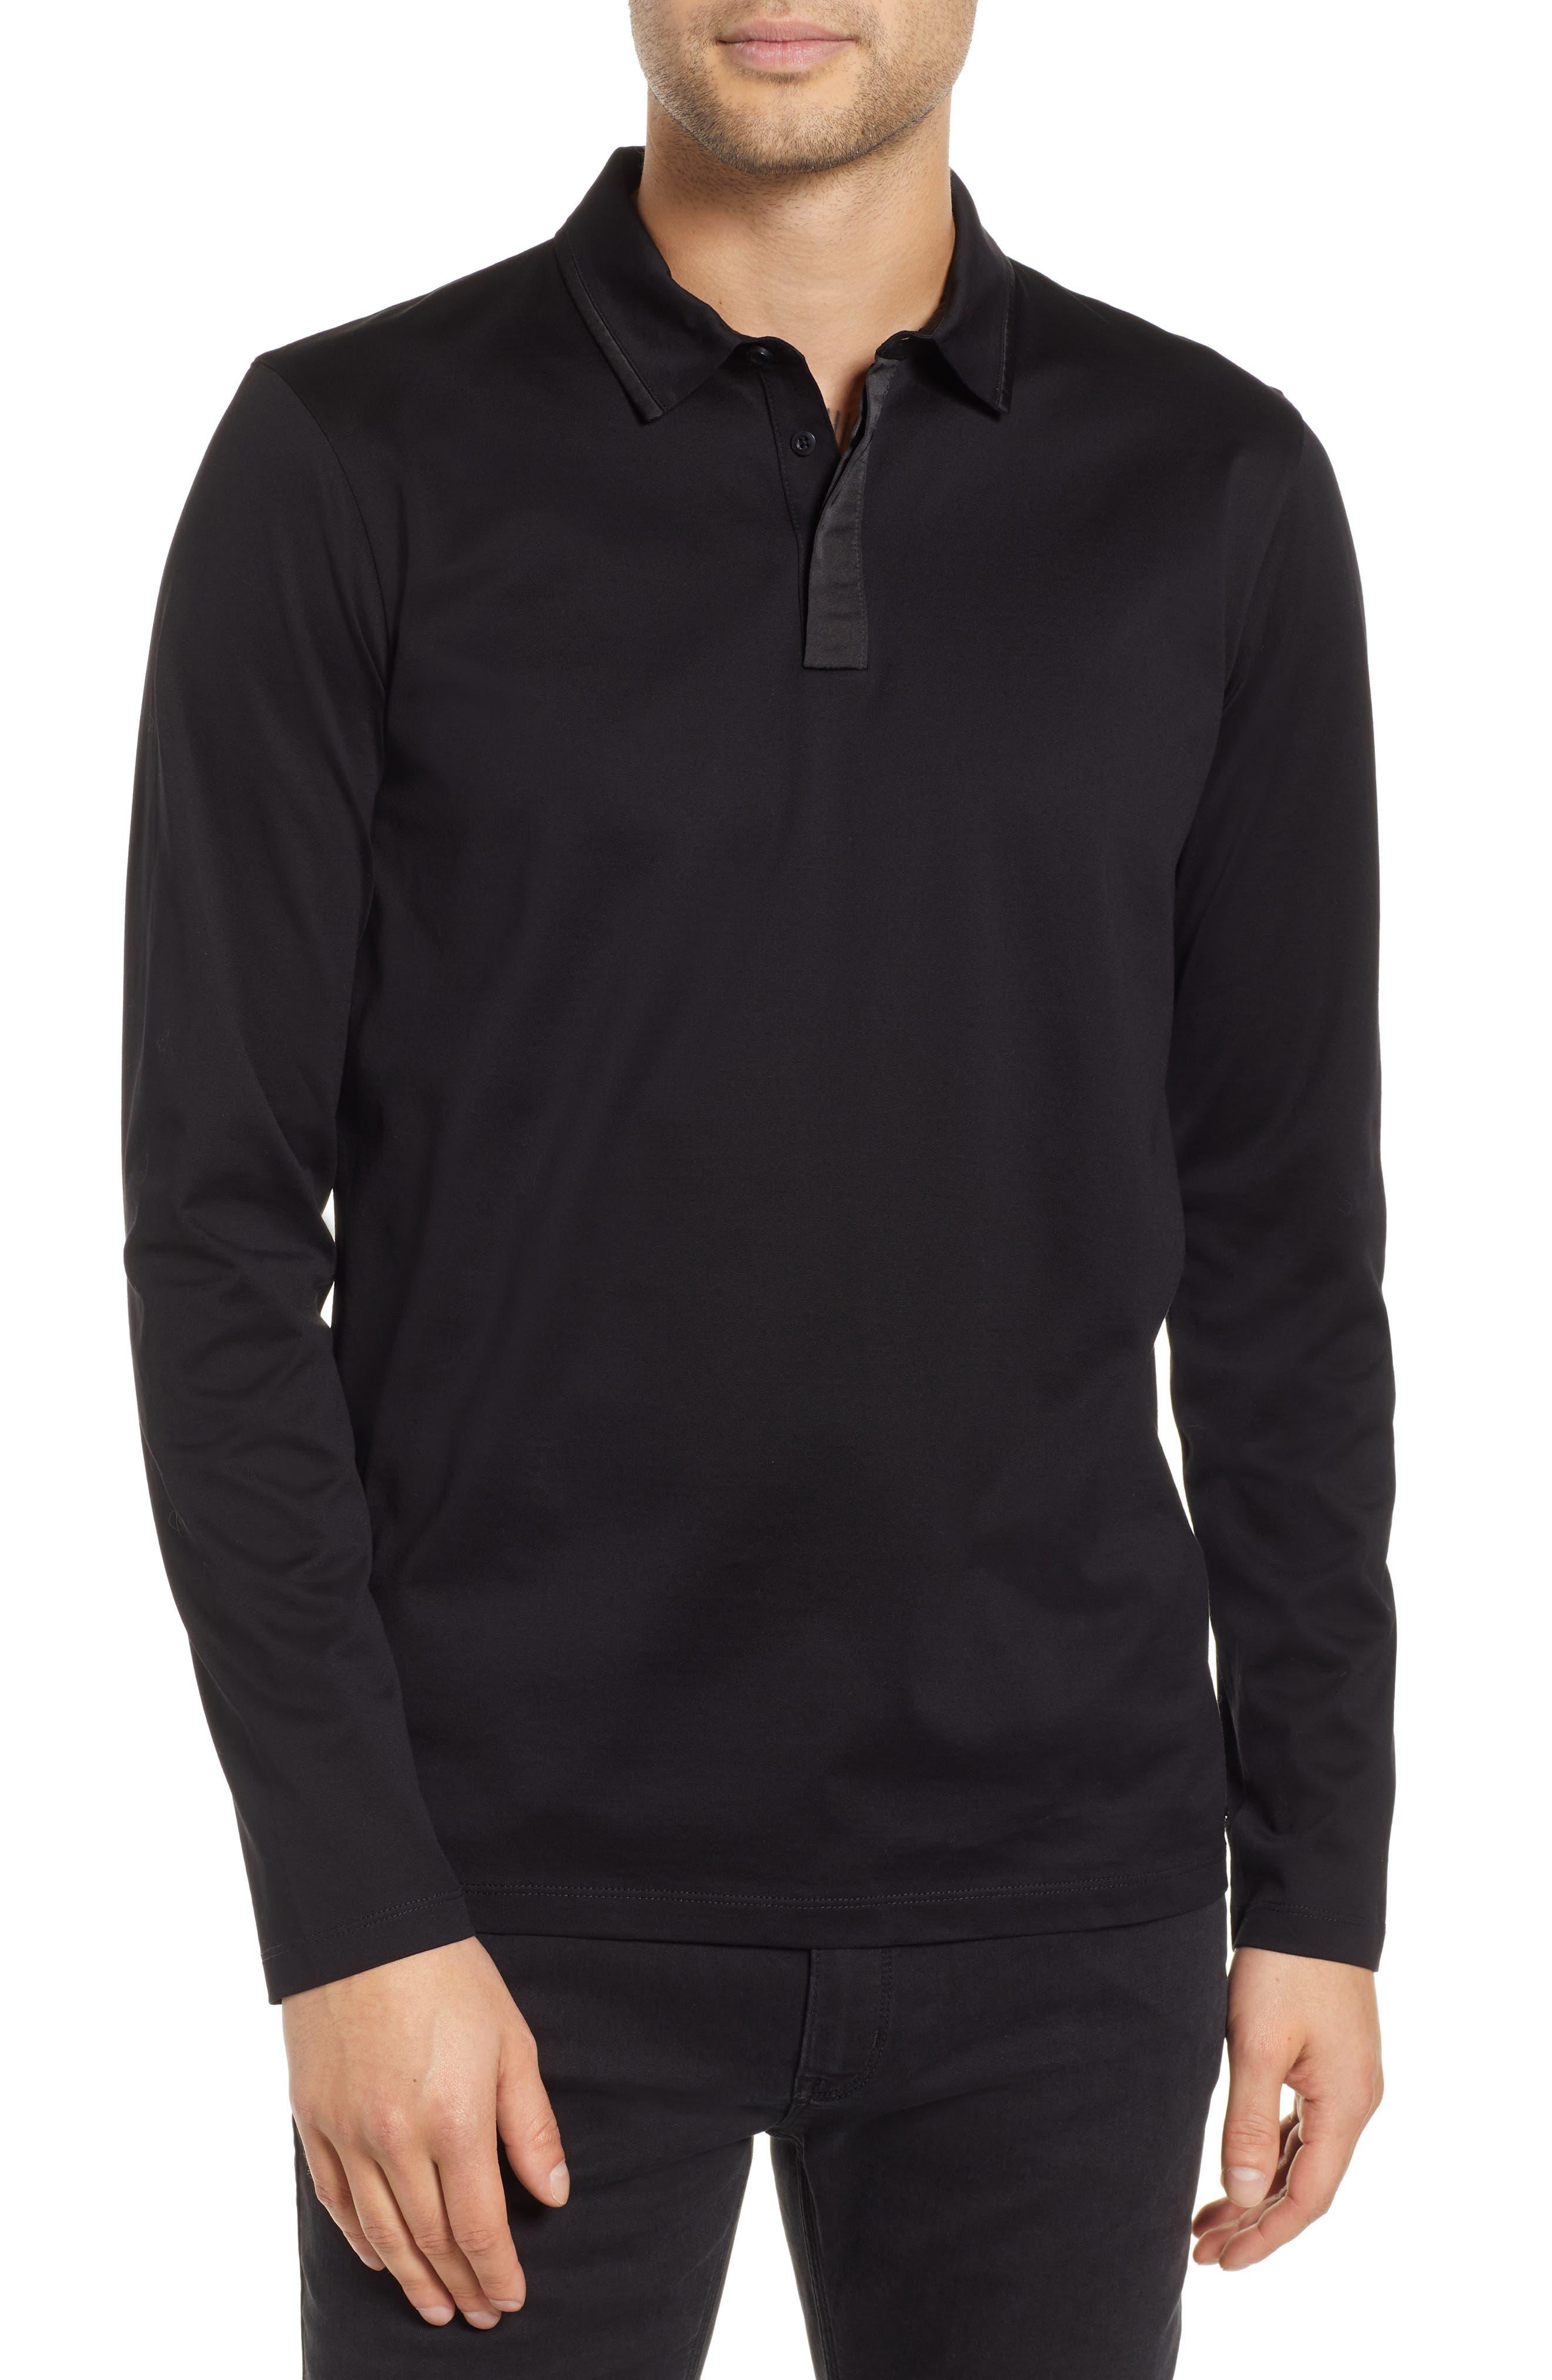 Dalendar Mercerized Cotton Slim Fit Polo Shirt,                         Main,                         color, BLACK